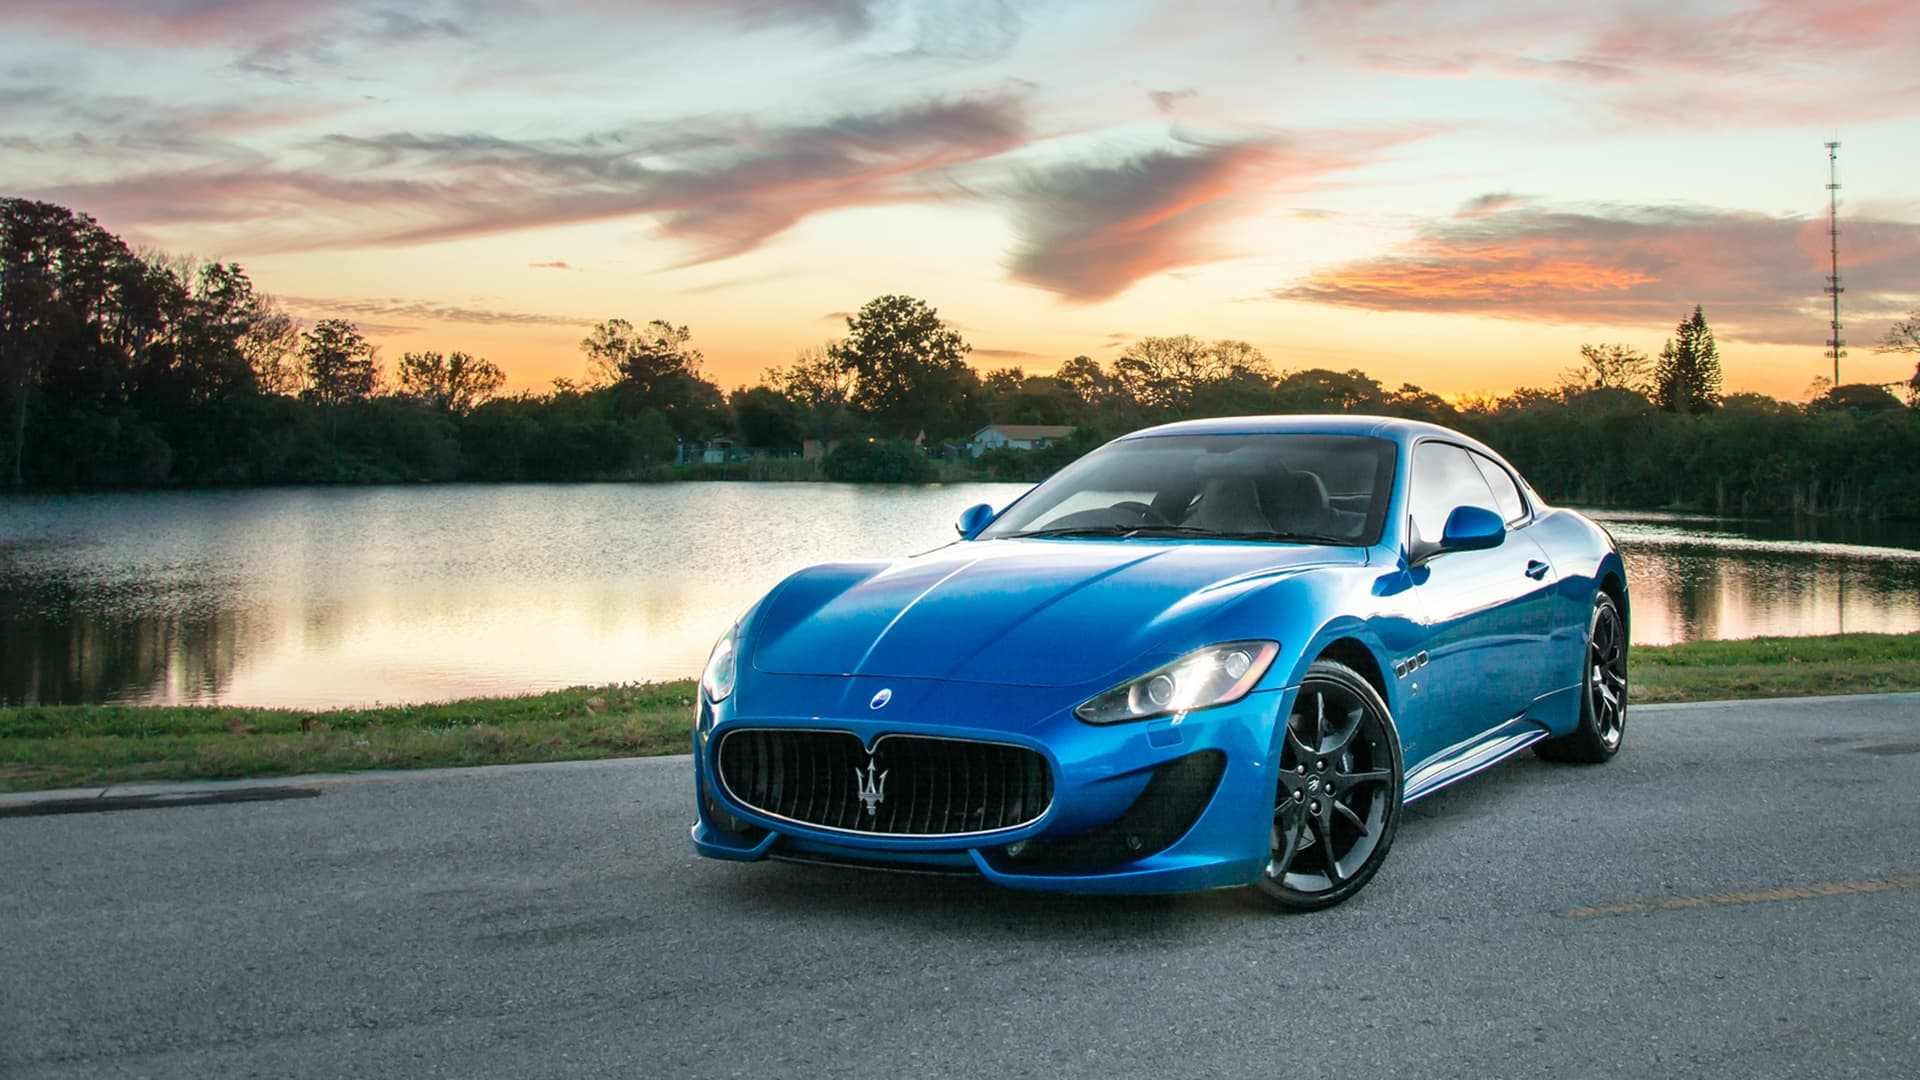 Maserati GranTurismo Toronto